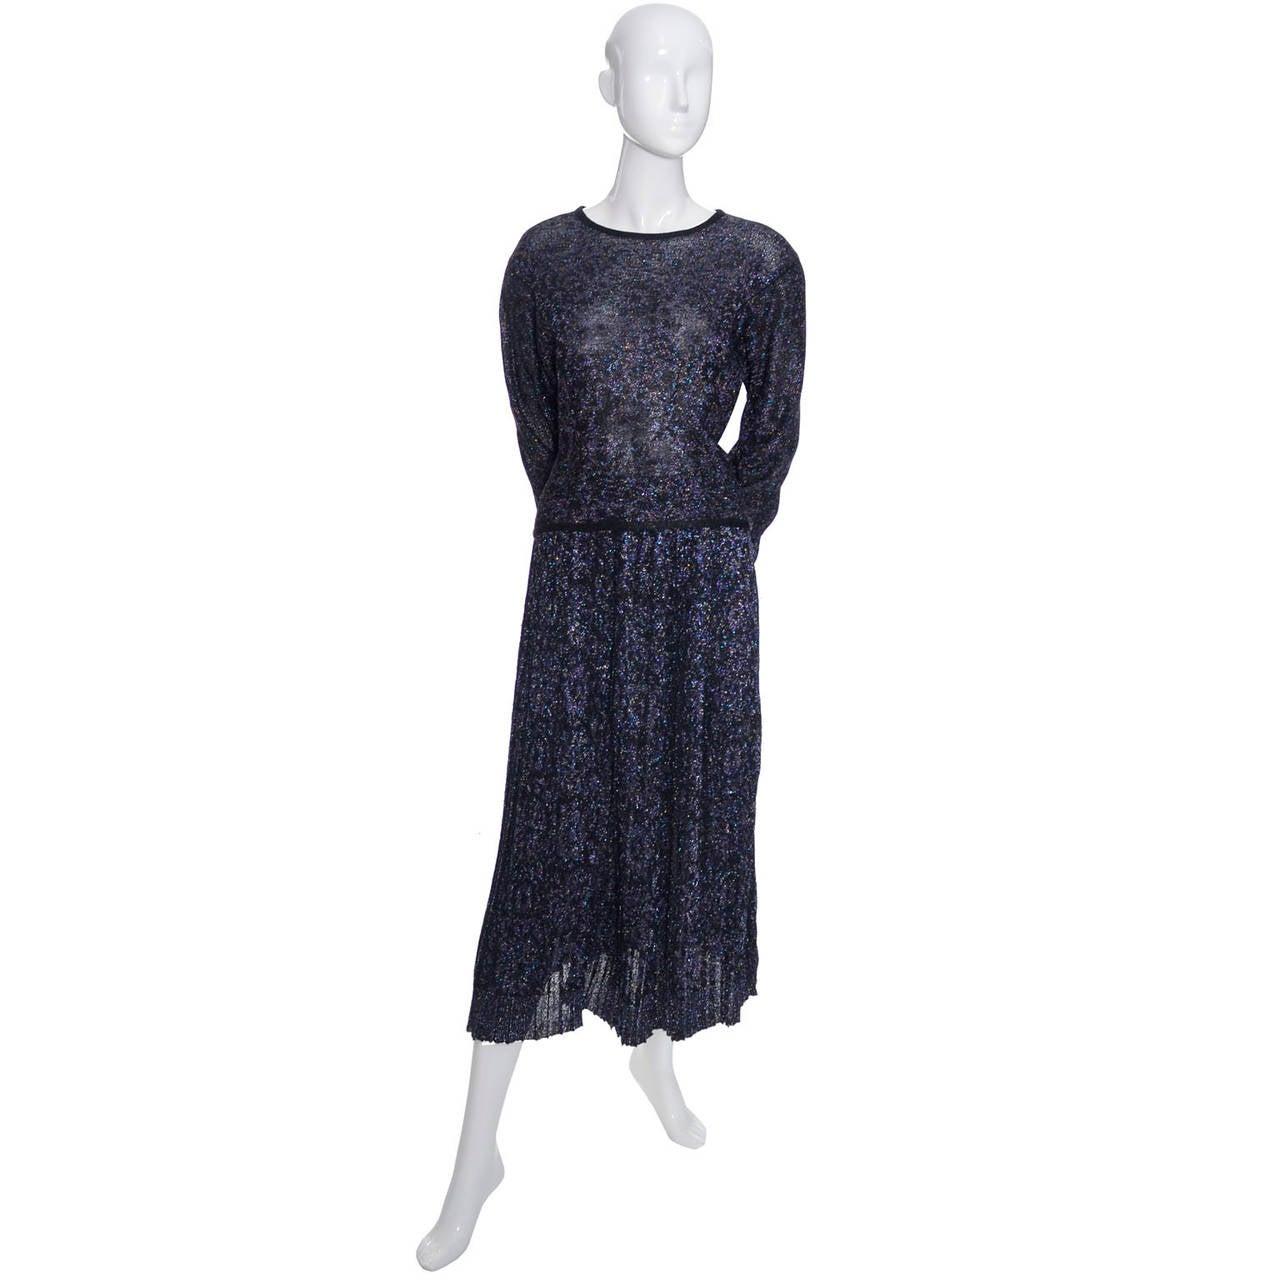 Black Missoni Metallic Sparkle Vintage Skirt Top Evening Outfit Saks Fifth Avenue For Sale